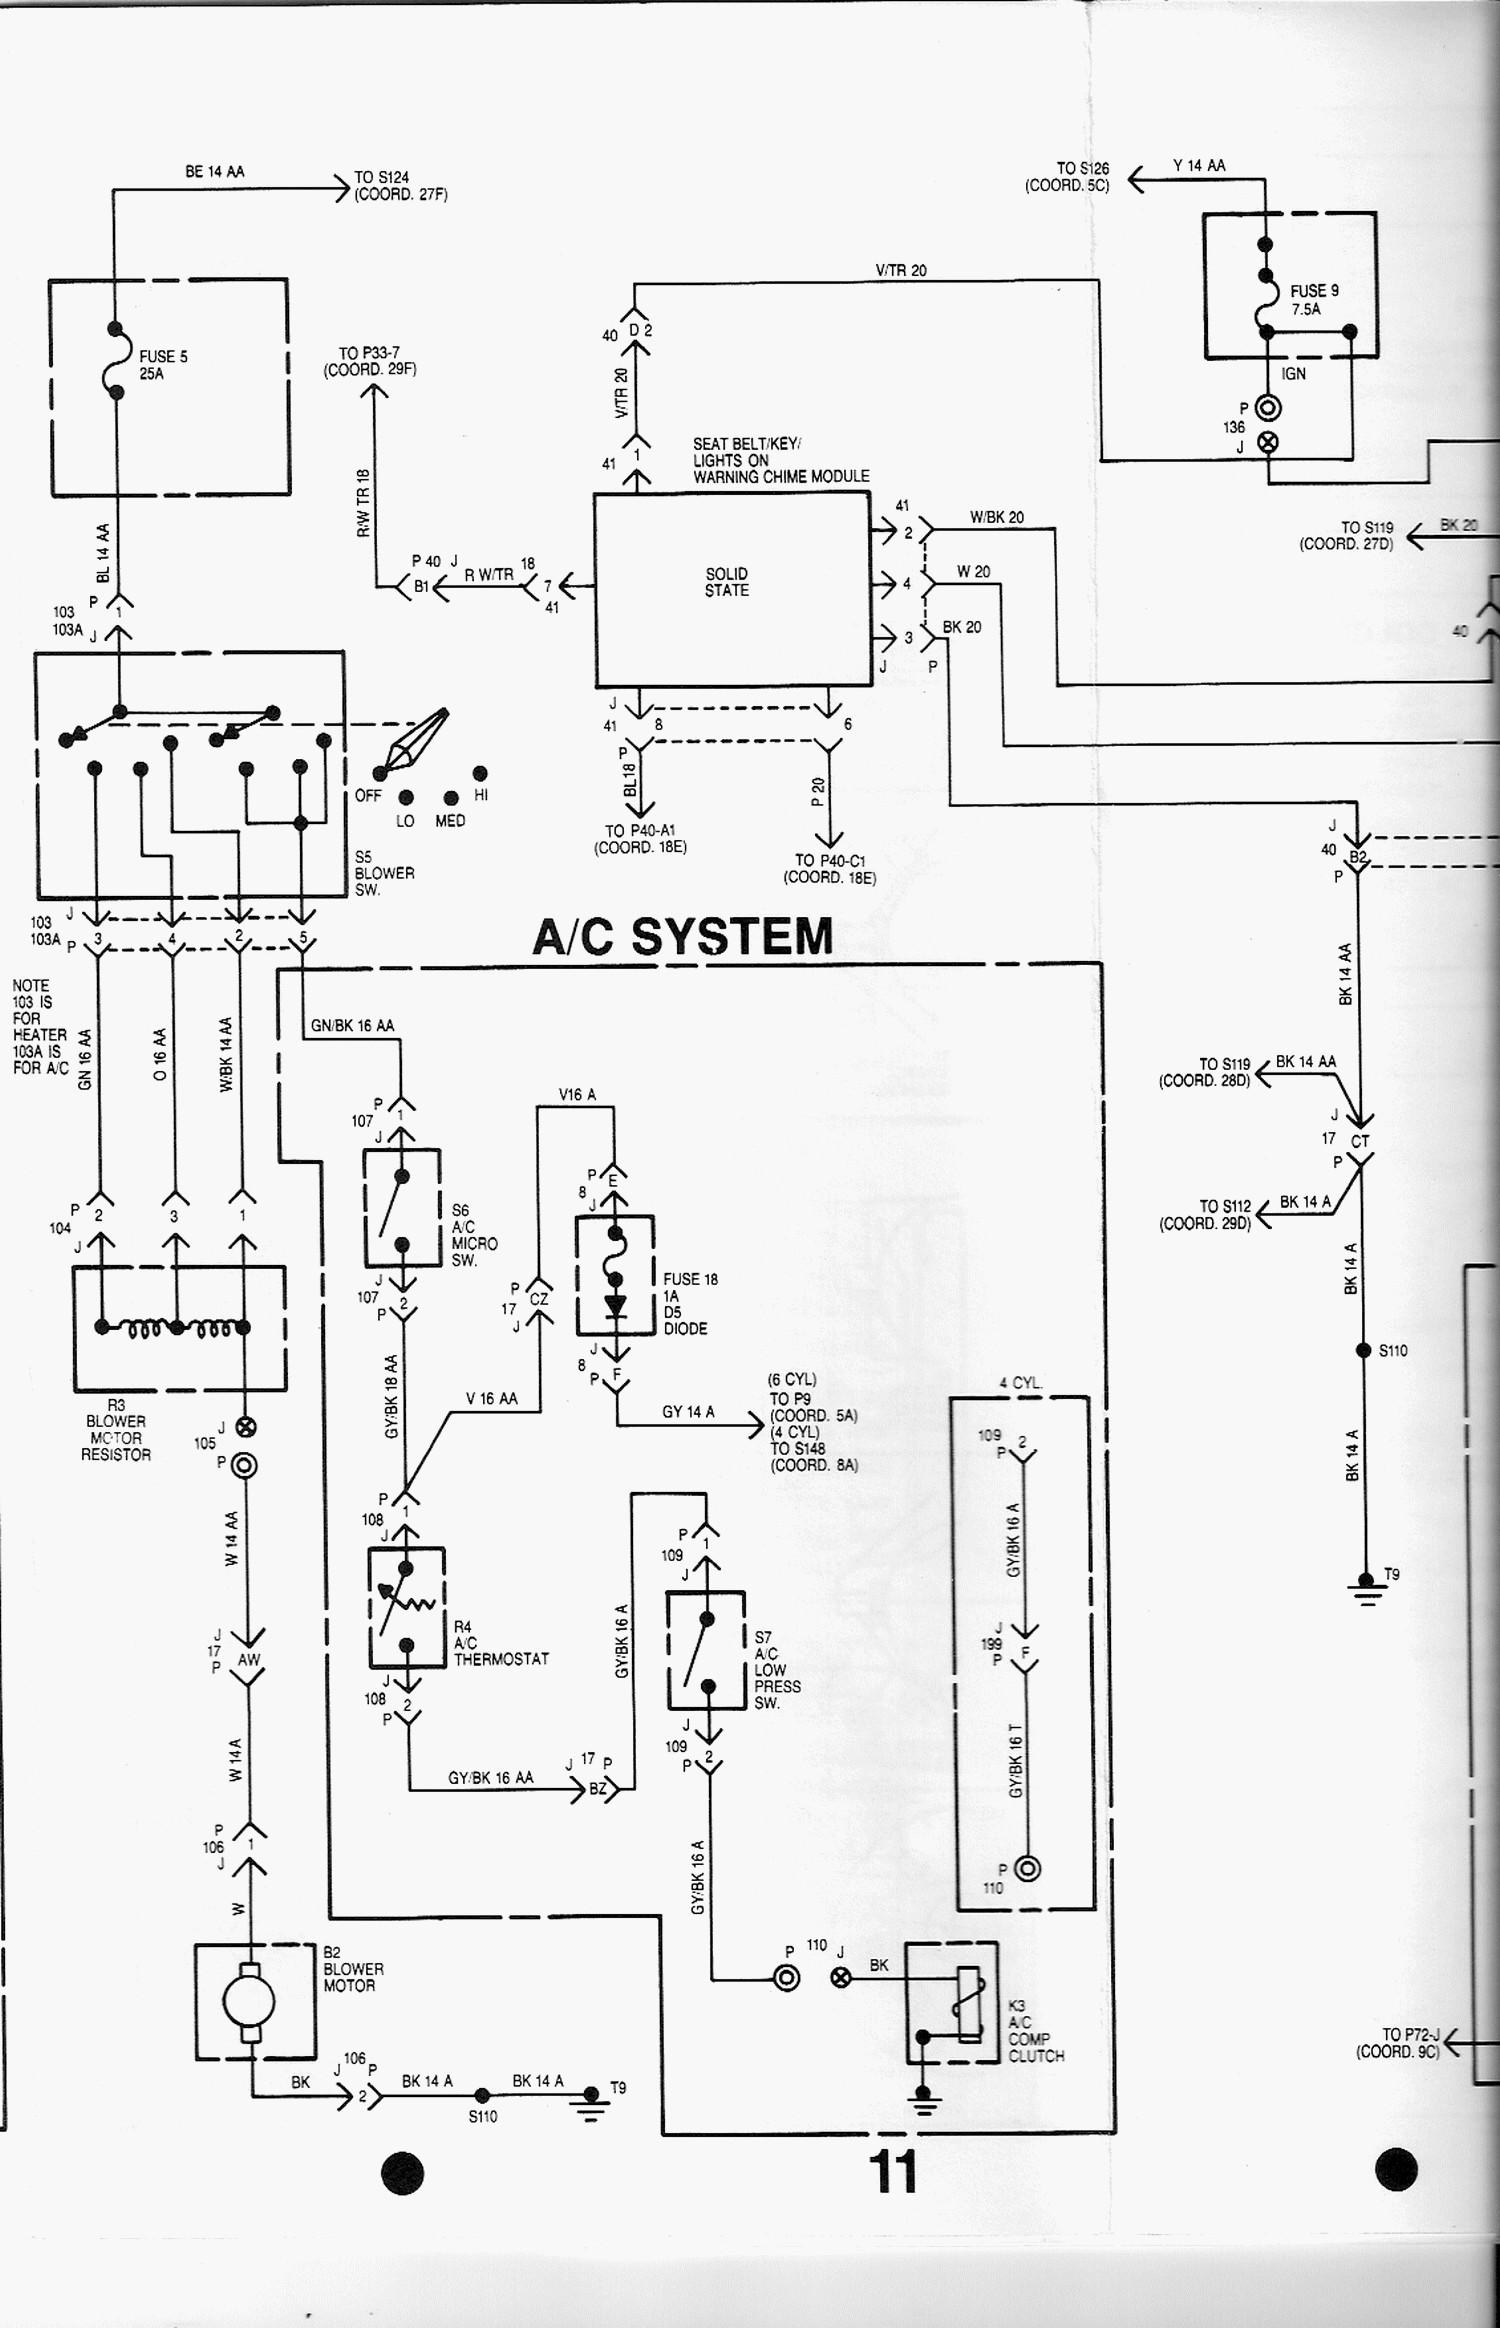 1978 jeep cj7 wiring diagram labeled of dna molecule 1985 amc eagle vacuum imageresizertool com